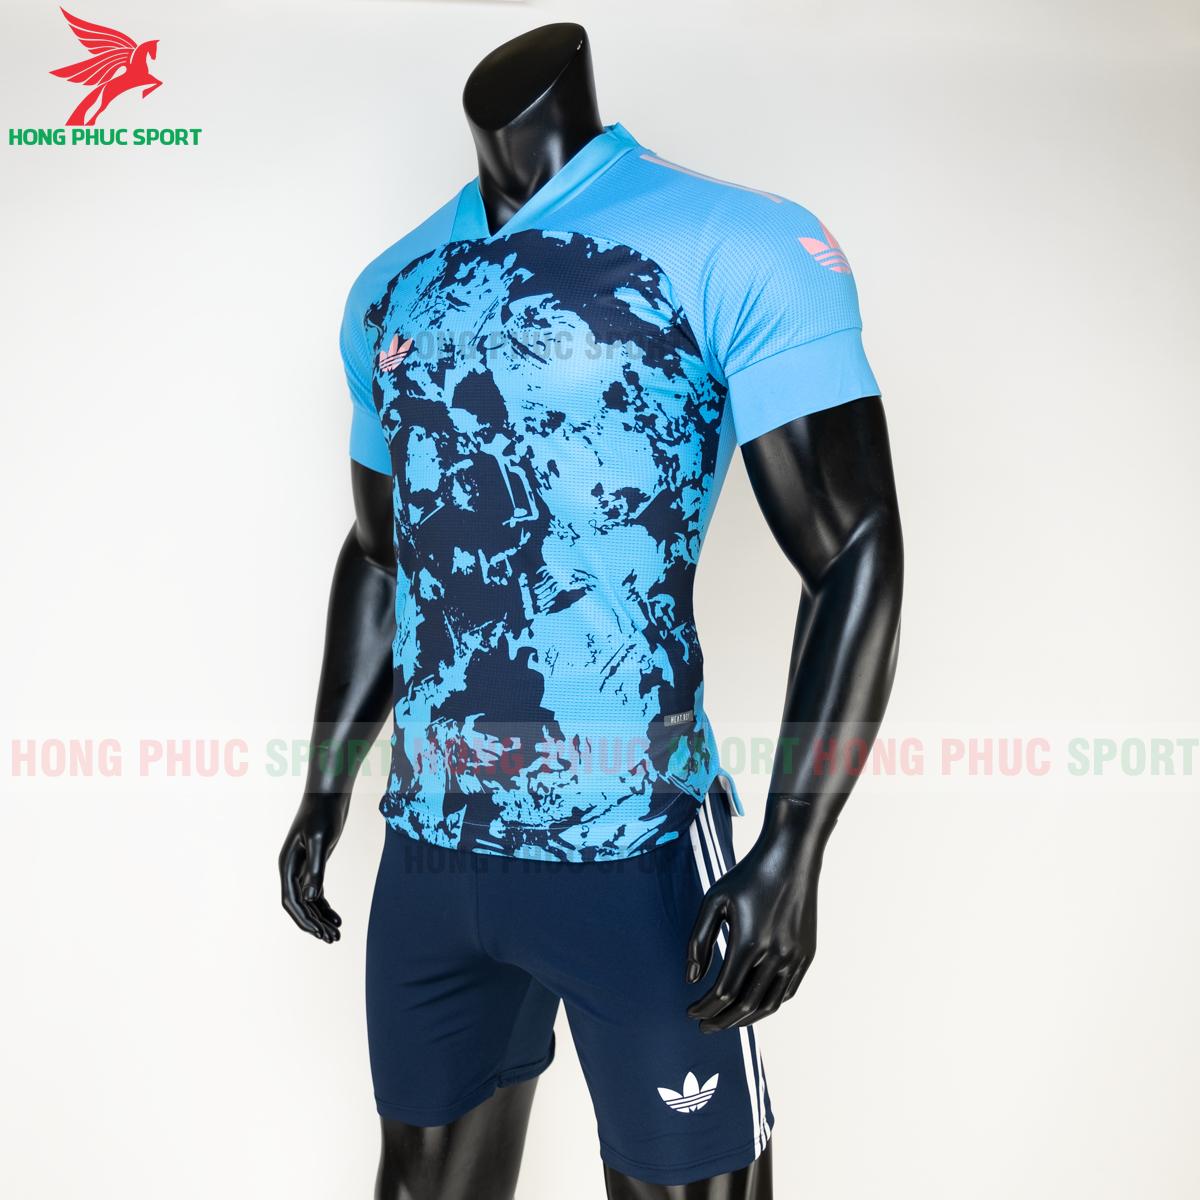 https://cdn.hongphucsport.com/unsafe/s4.shopbay.vn/files/285/ao-bong-da-condivo-template-20-21-hang-thailand-mau5-4-5fae5506ec663.png